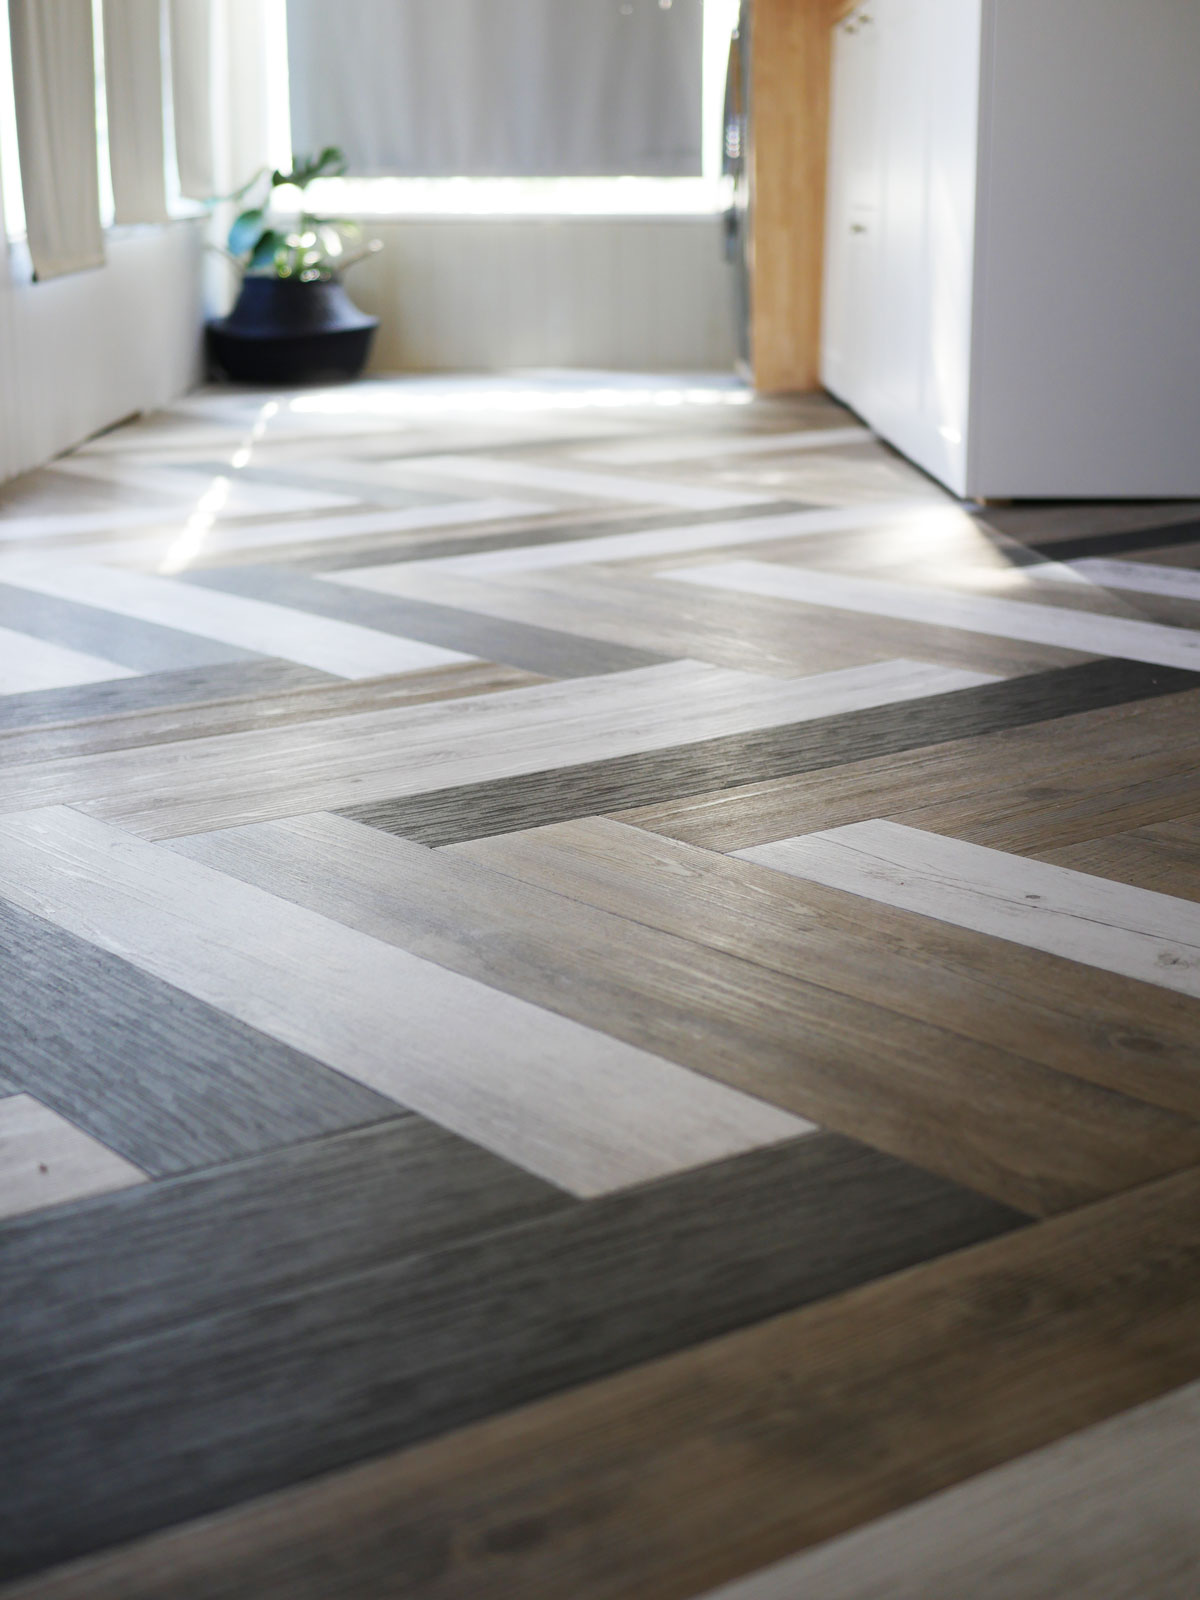 Stick down herringbone floor